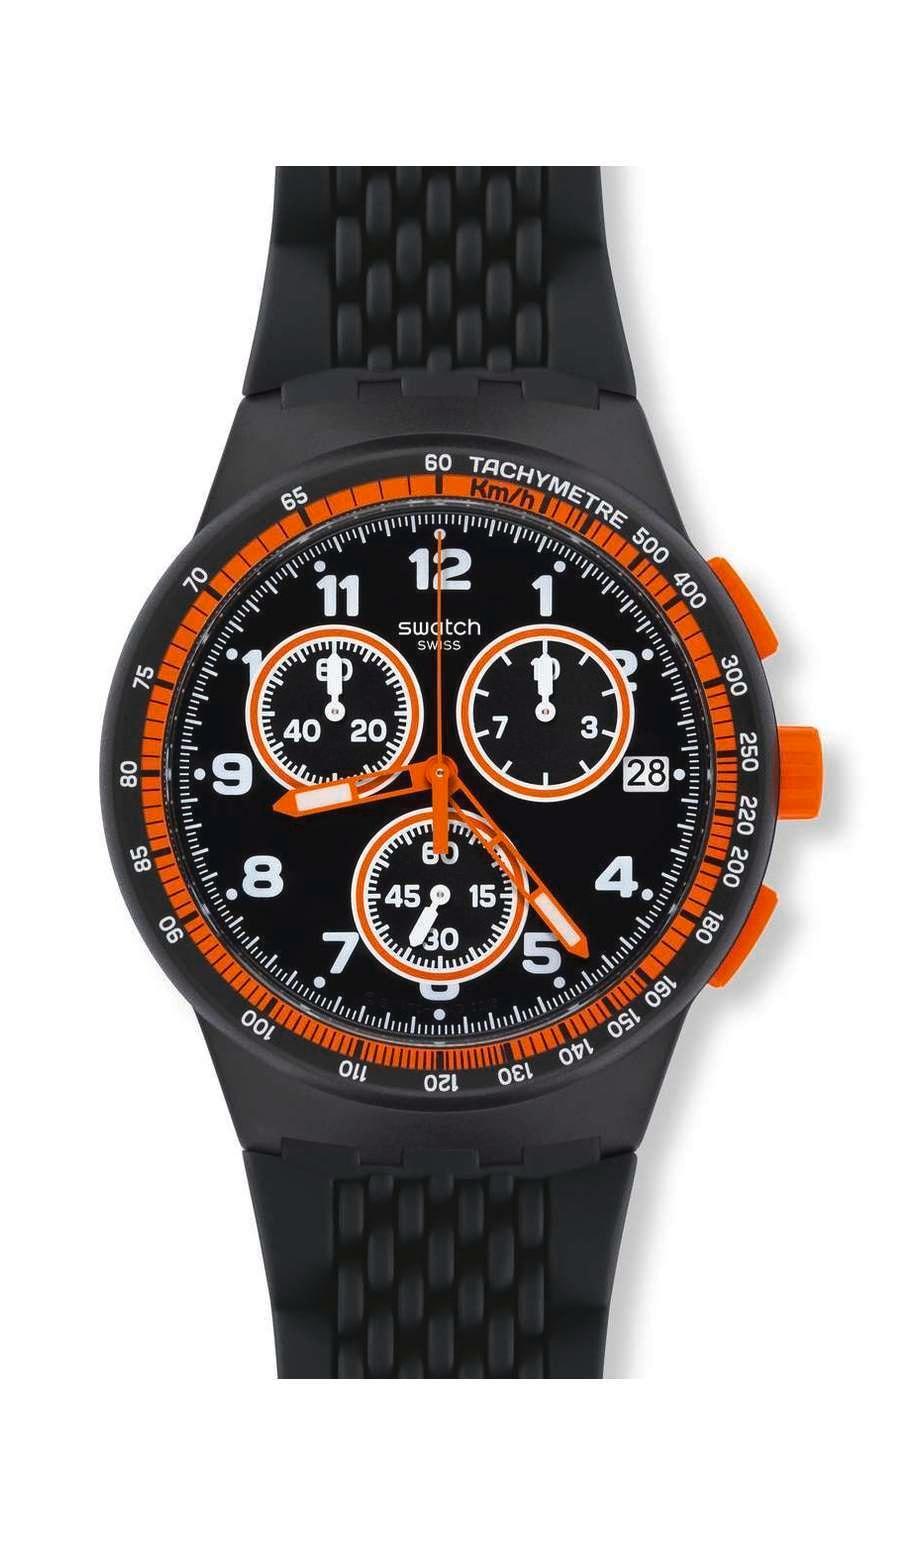 Swatch - NEROLINO - 1